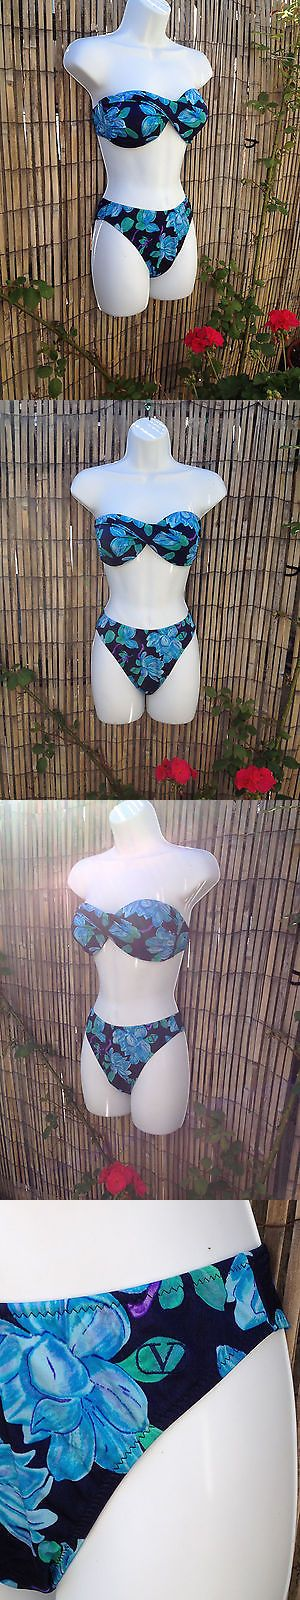 Swimwear 175794: Valentino Bikini Swimsuit Italy 44 L Hi Cut Twist Bandeau Floral Blue Usa Medium -> BUY IT NOW ONLY: $47.7 on eBay!